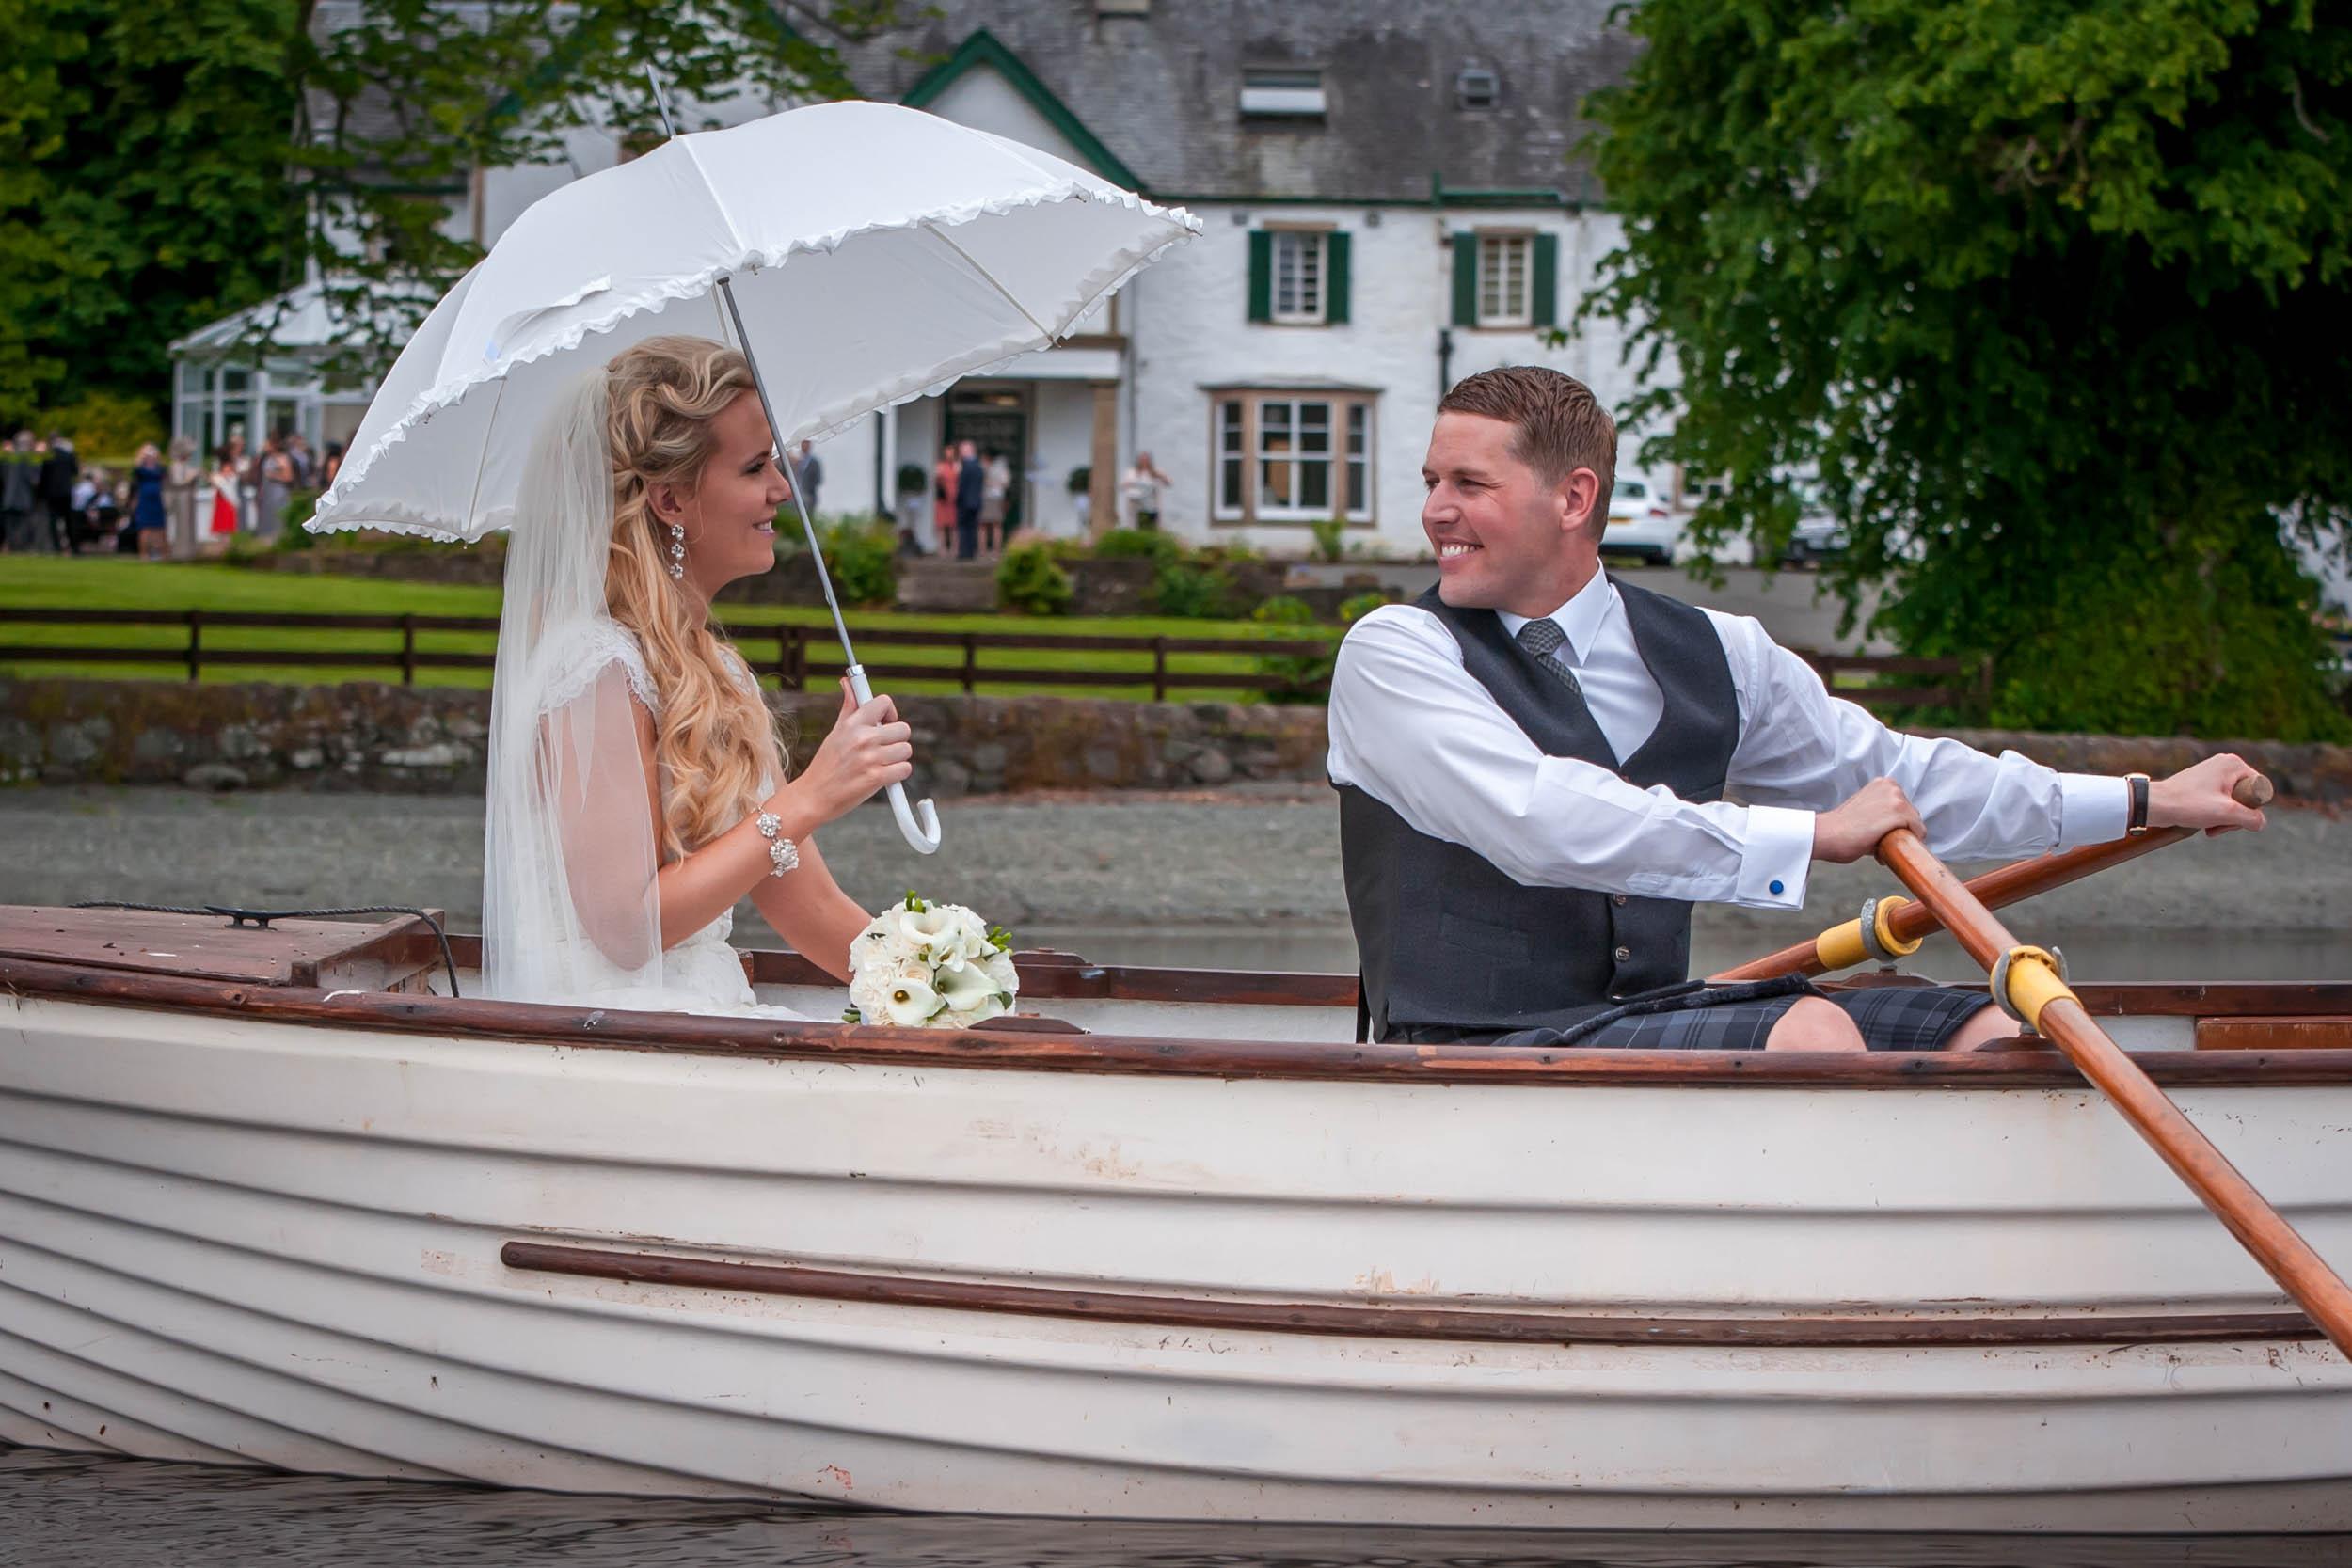 Weddings-Paul-Saunders-Photography-9761.jpg